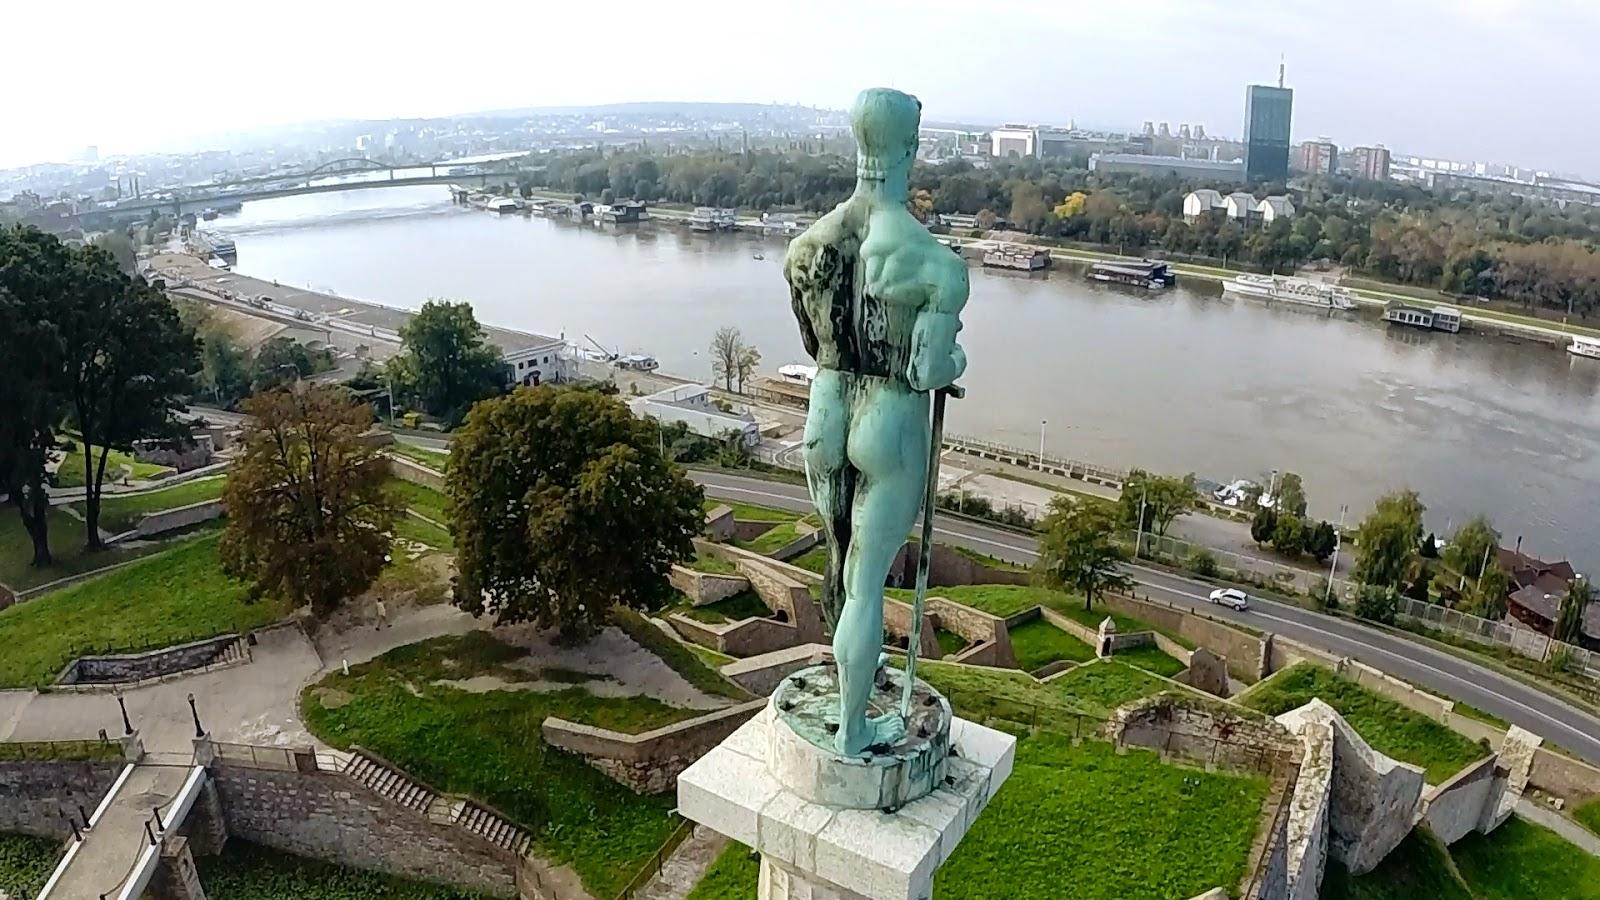 Snimanje iz vazduha: Kalemegdan - Beograd